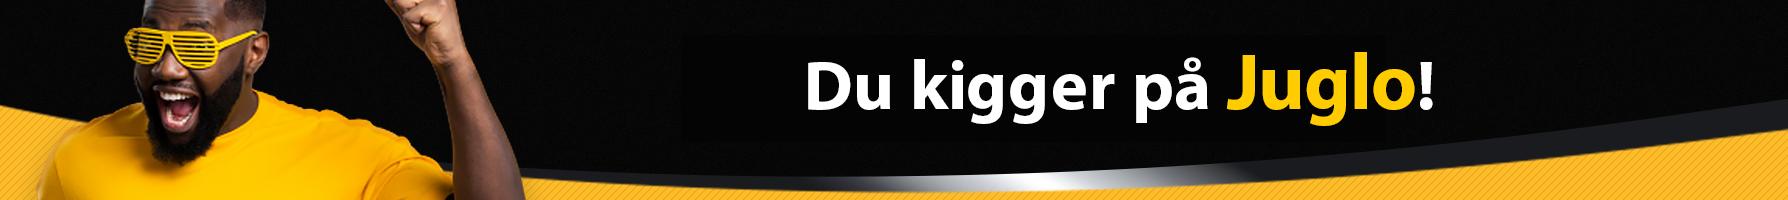 Juglo Navigation Guide